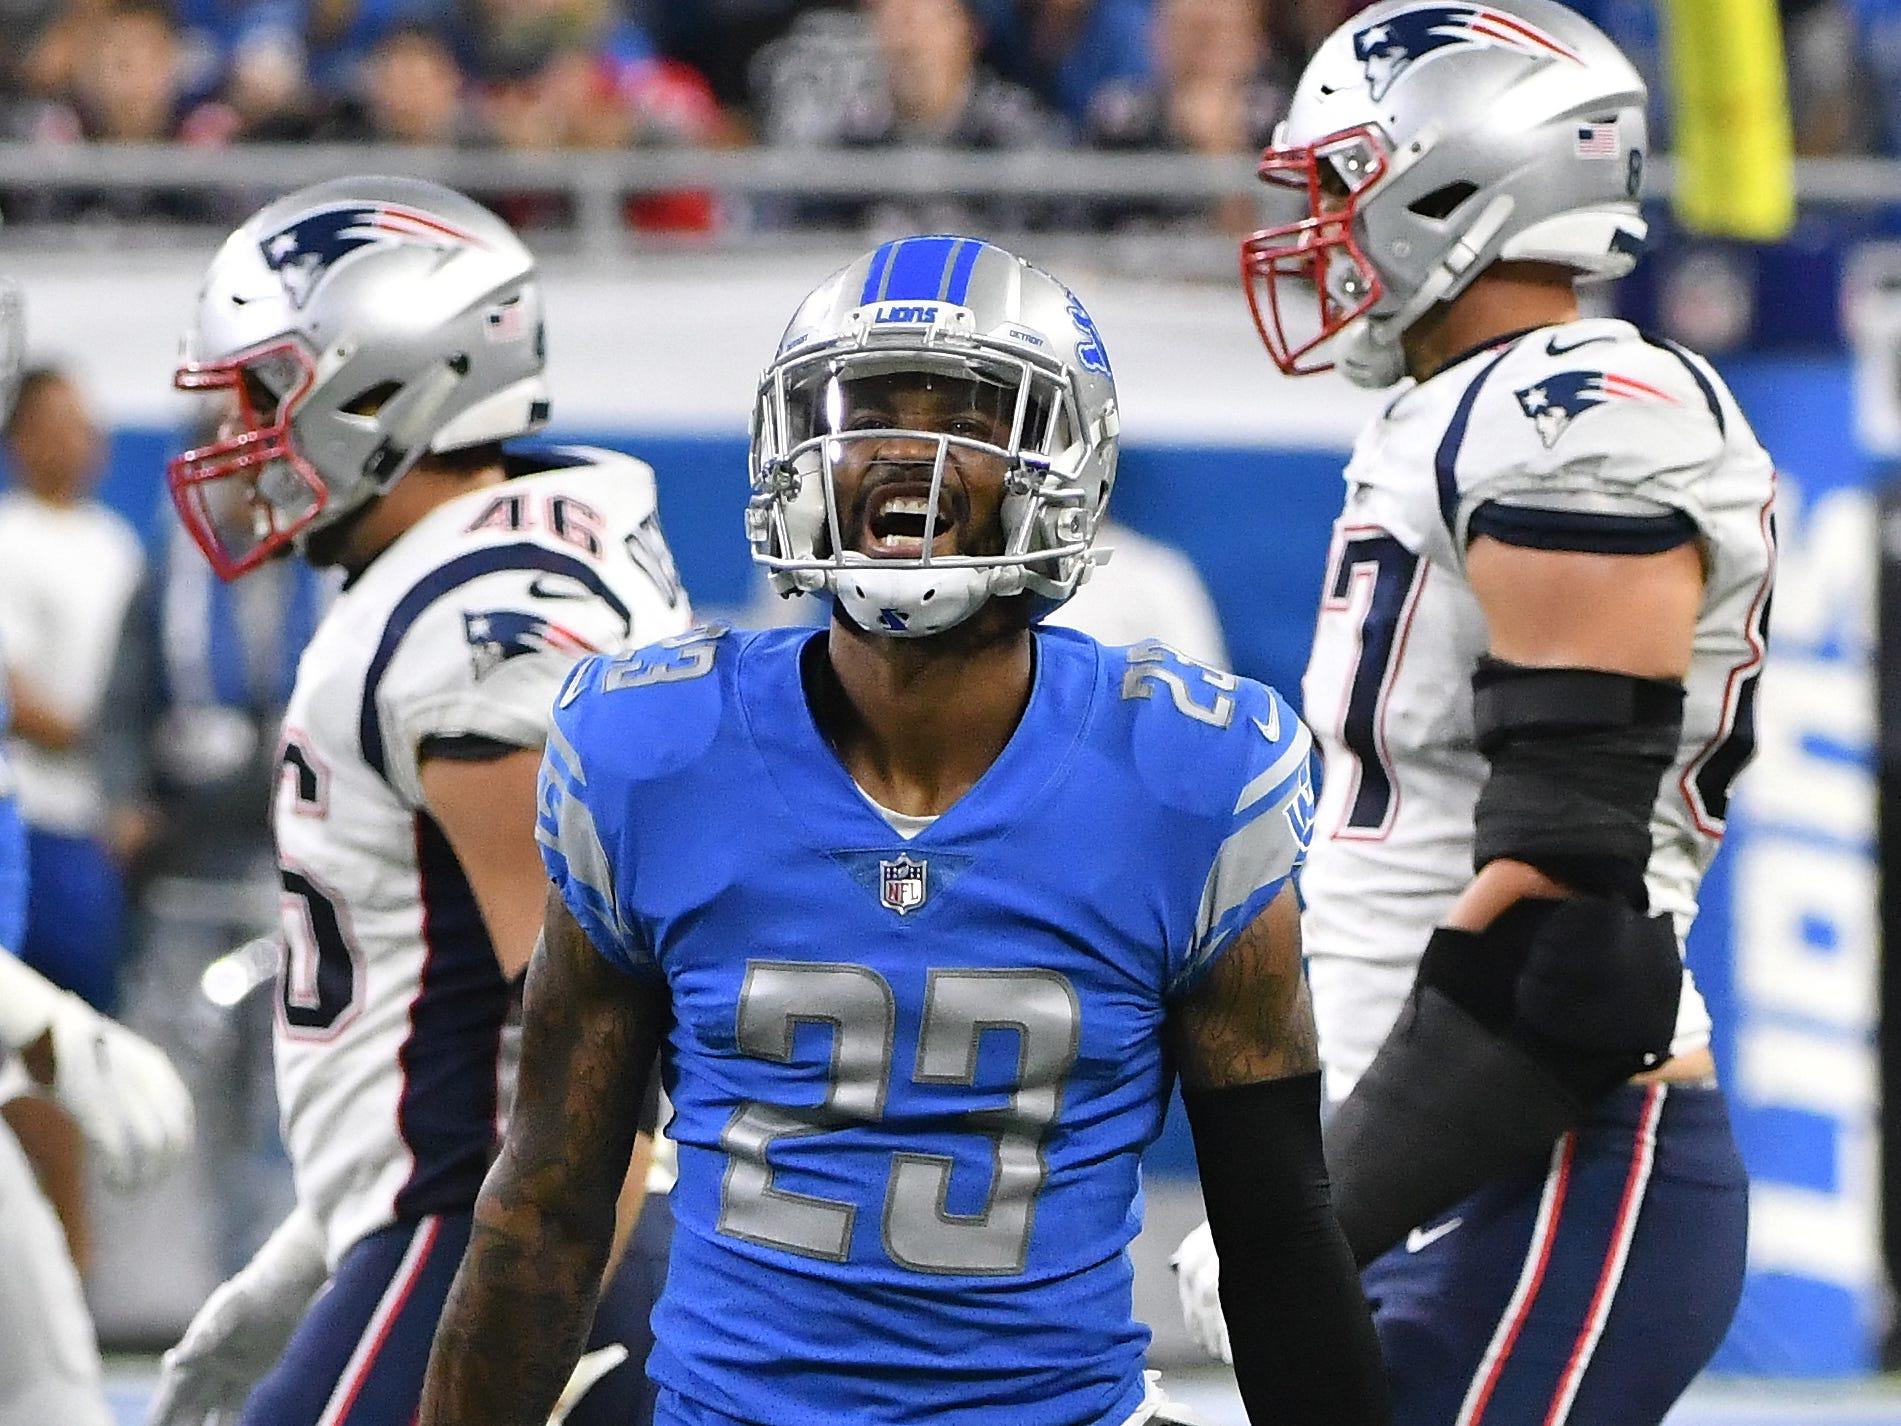 Lions cornerback Darius Slay celebrates after intercepting a Patriots quarterback Tom Brady pass in the 4th quarter.